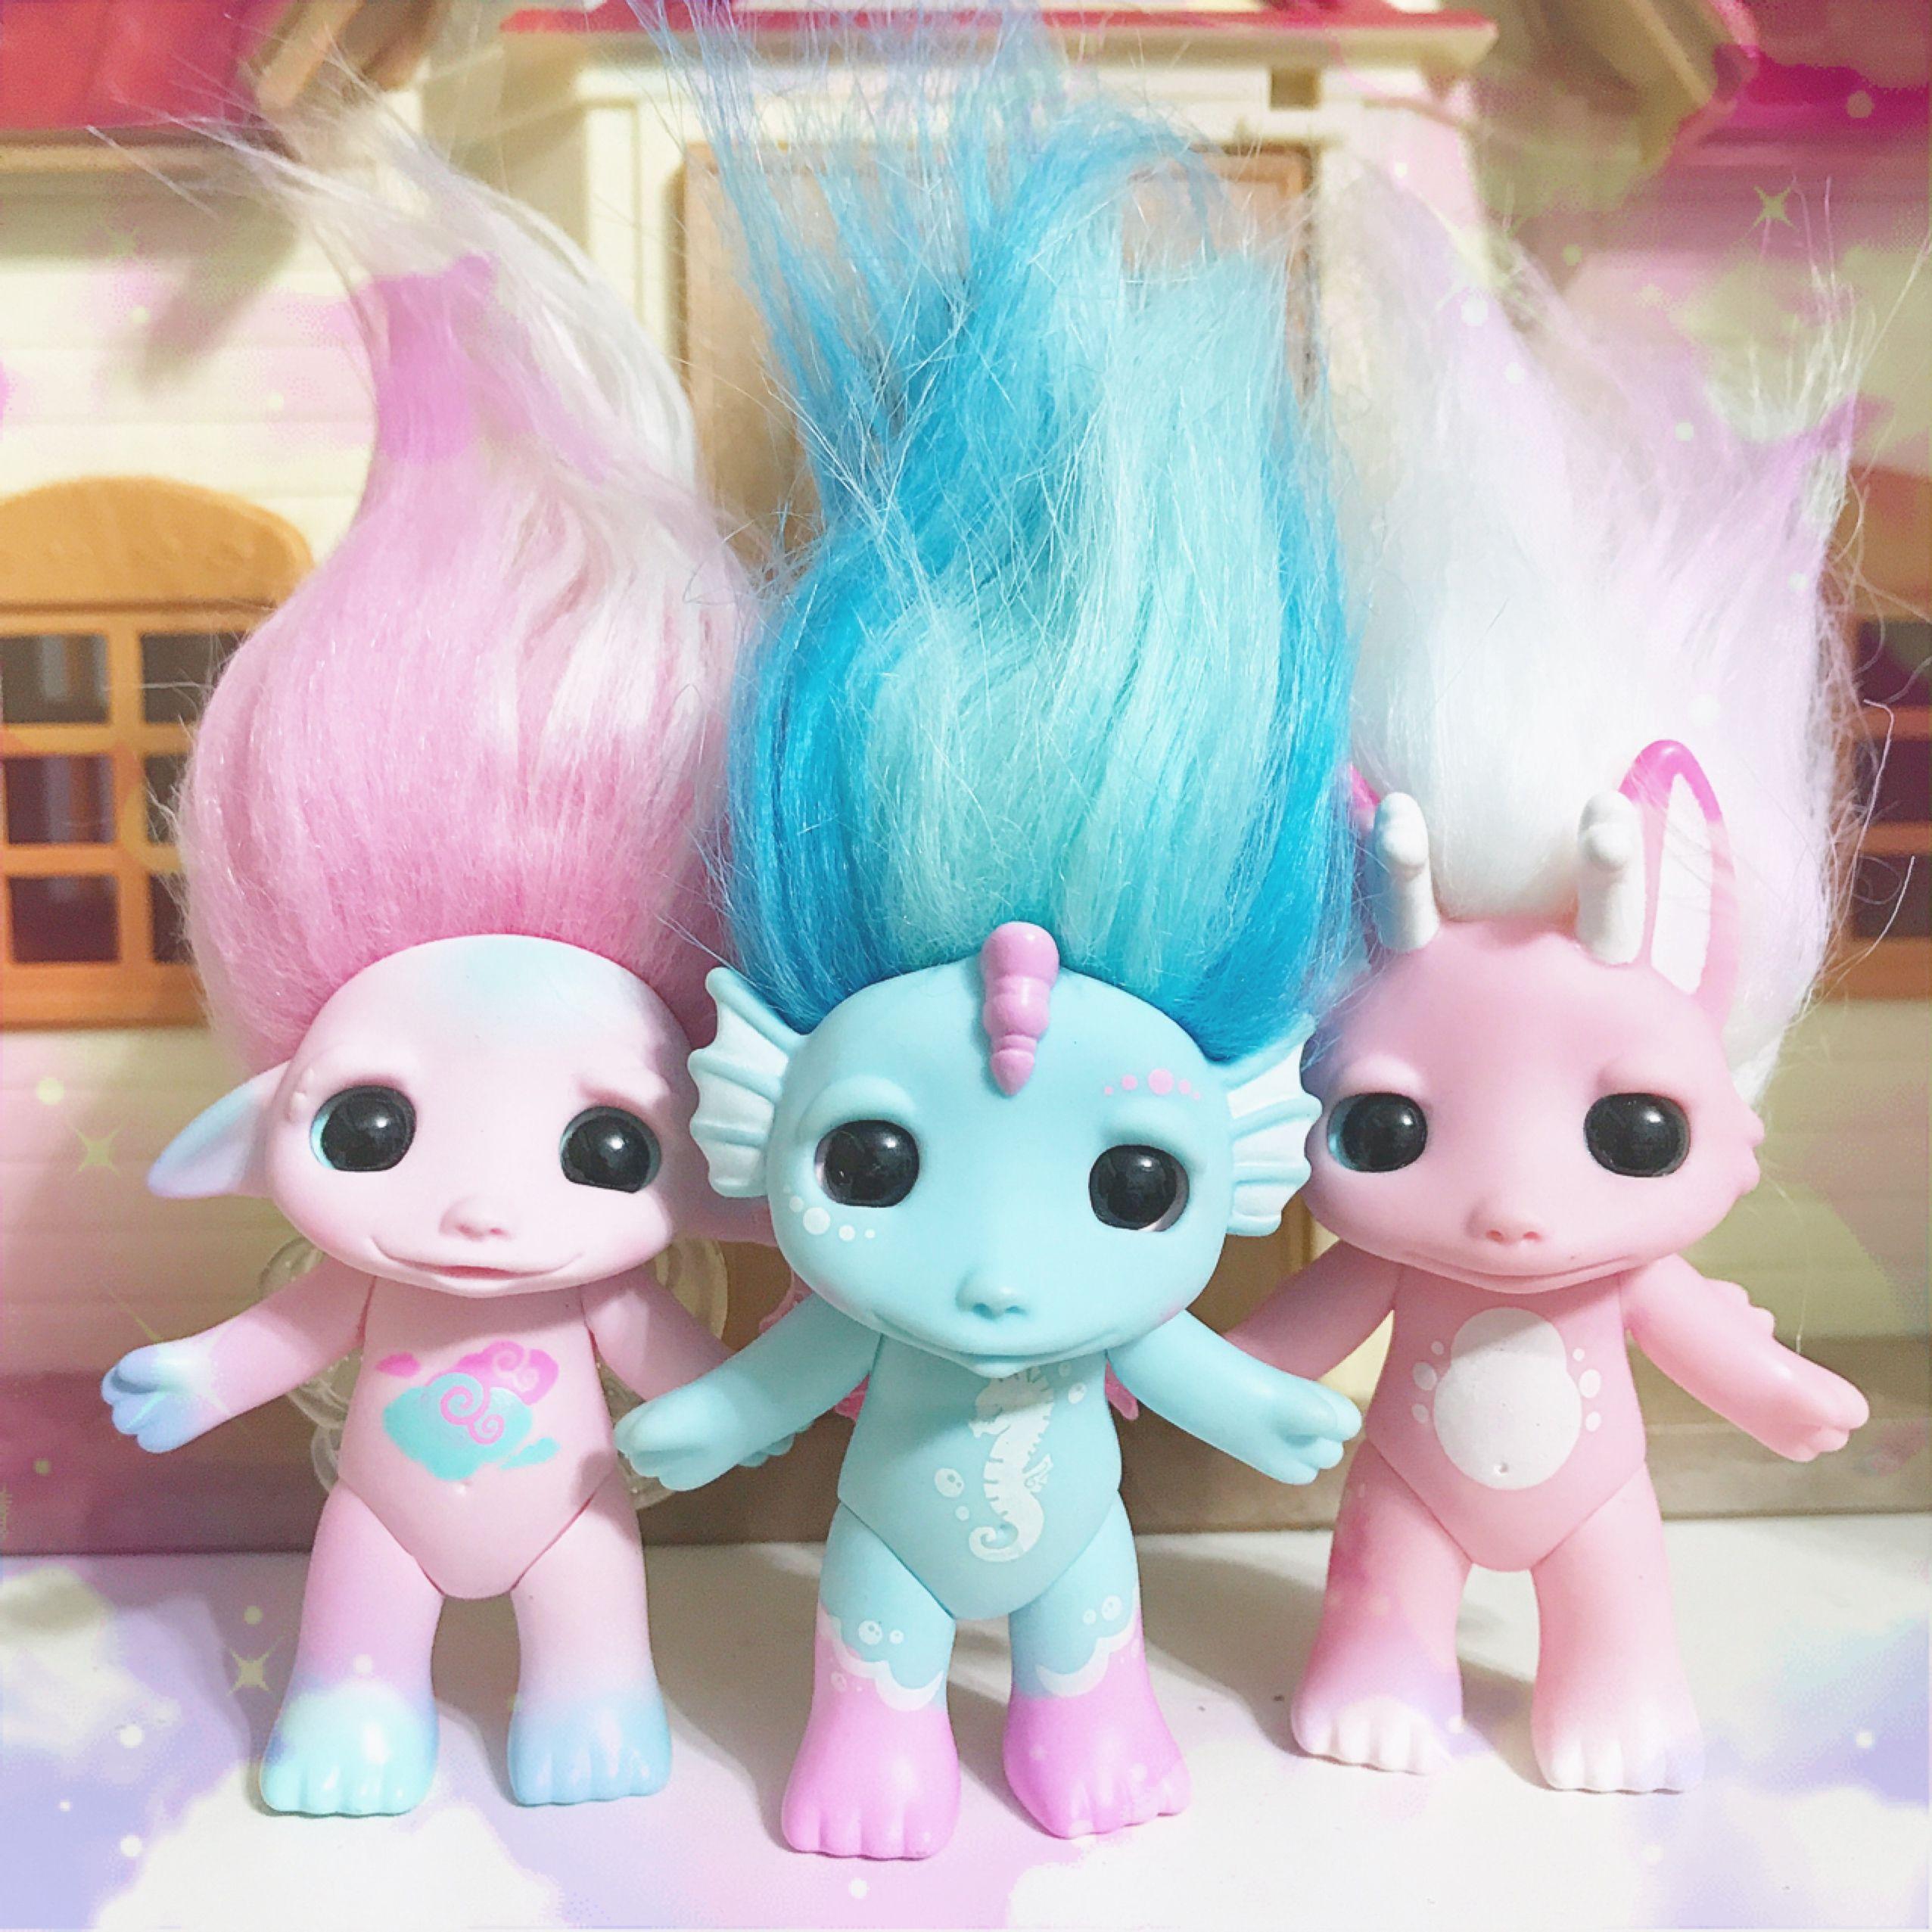 Kawaii Cute Toy Toys Zelf The Zelfs Zelfos Pastel Pastels